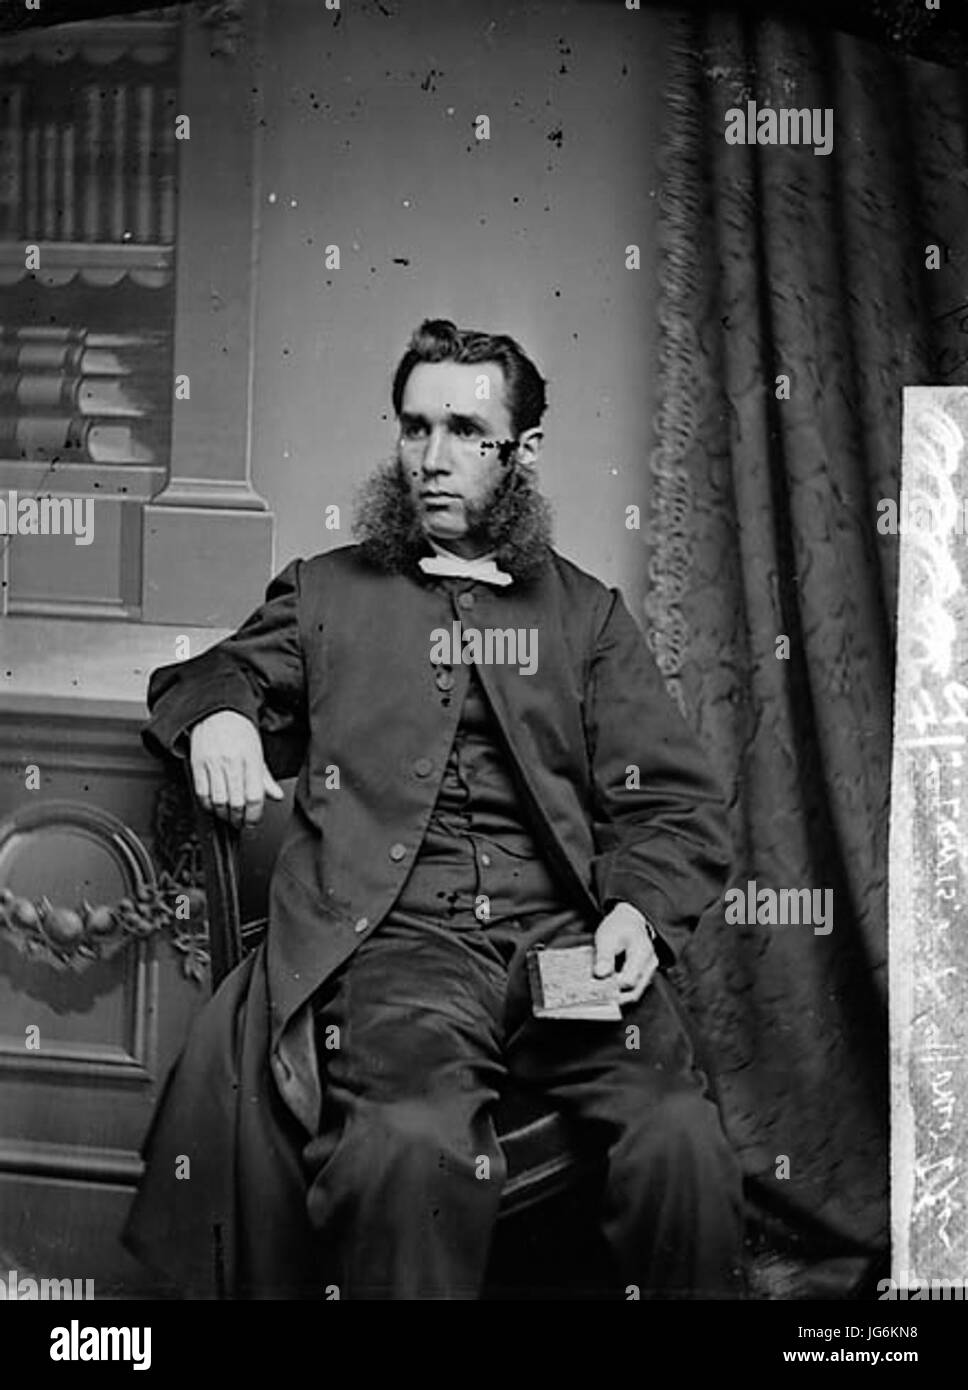 Revd John Wyndham Lewis 28Homo Ddu 1837-9529 NLW3362138 - Stock Image